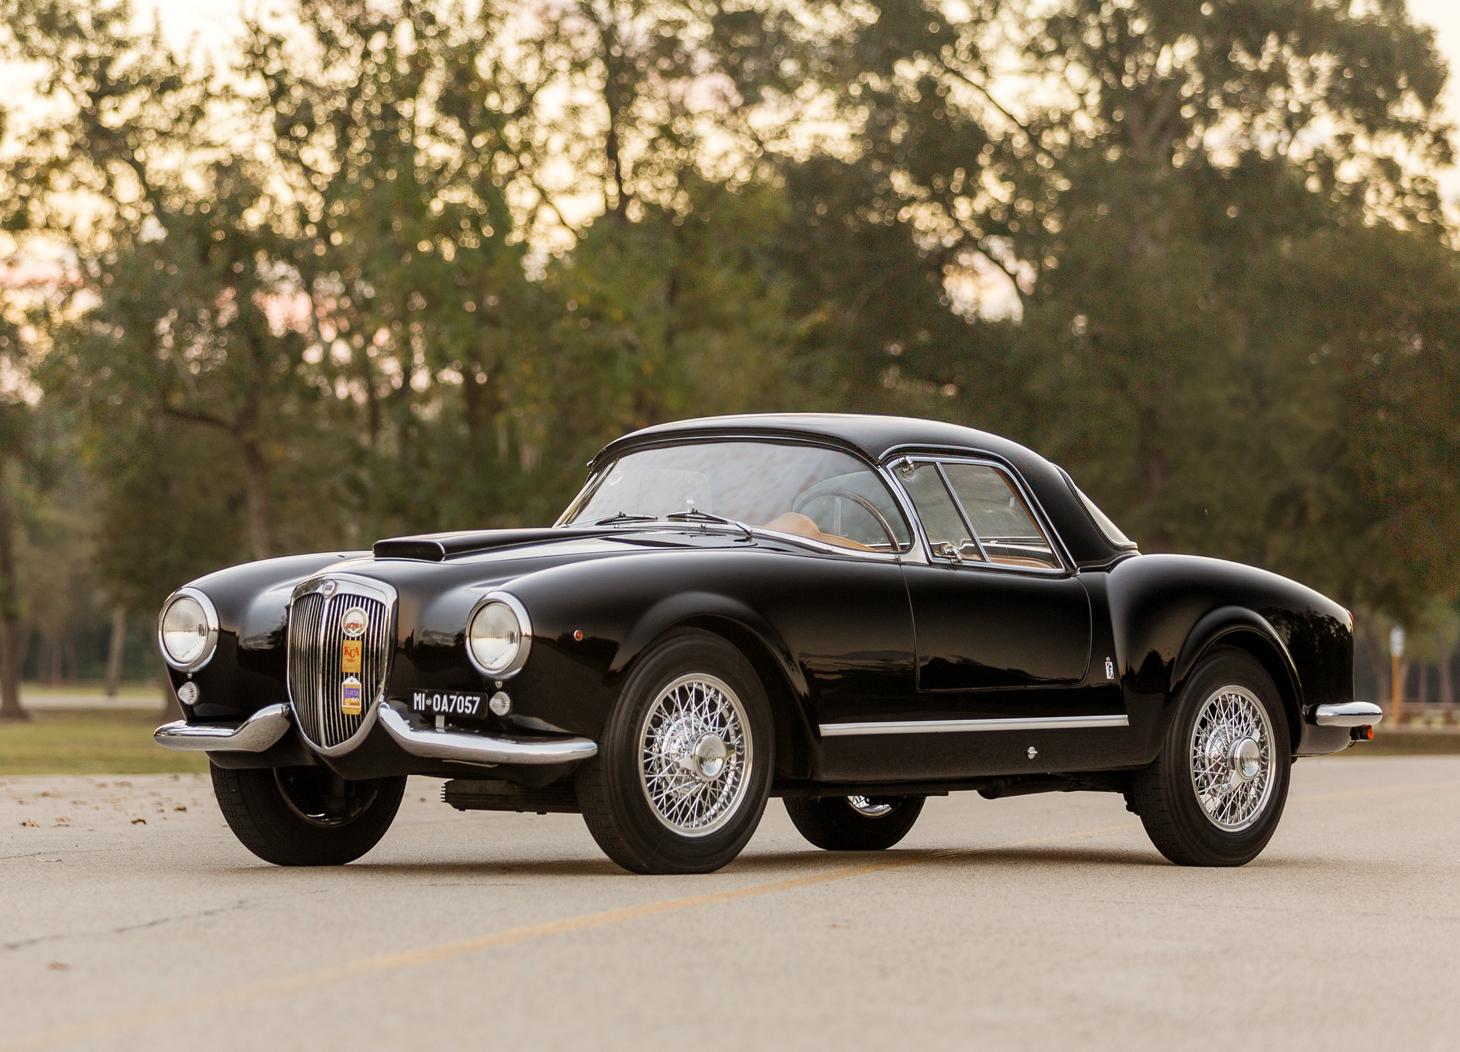 http://revivaler.com/wp-content/uploads/2016/10/Lancia-Aurelia-B24S-Spider-America-HDR-2_1a.jpg